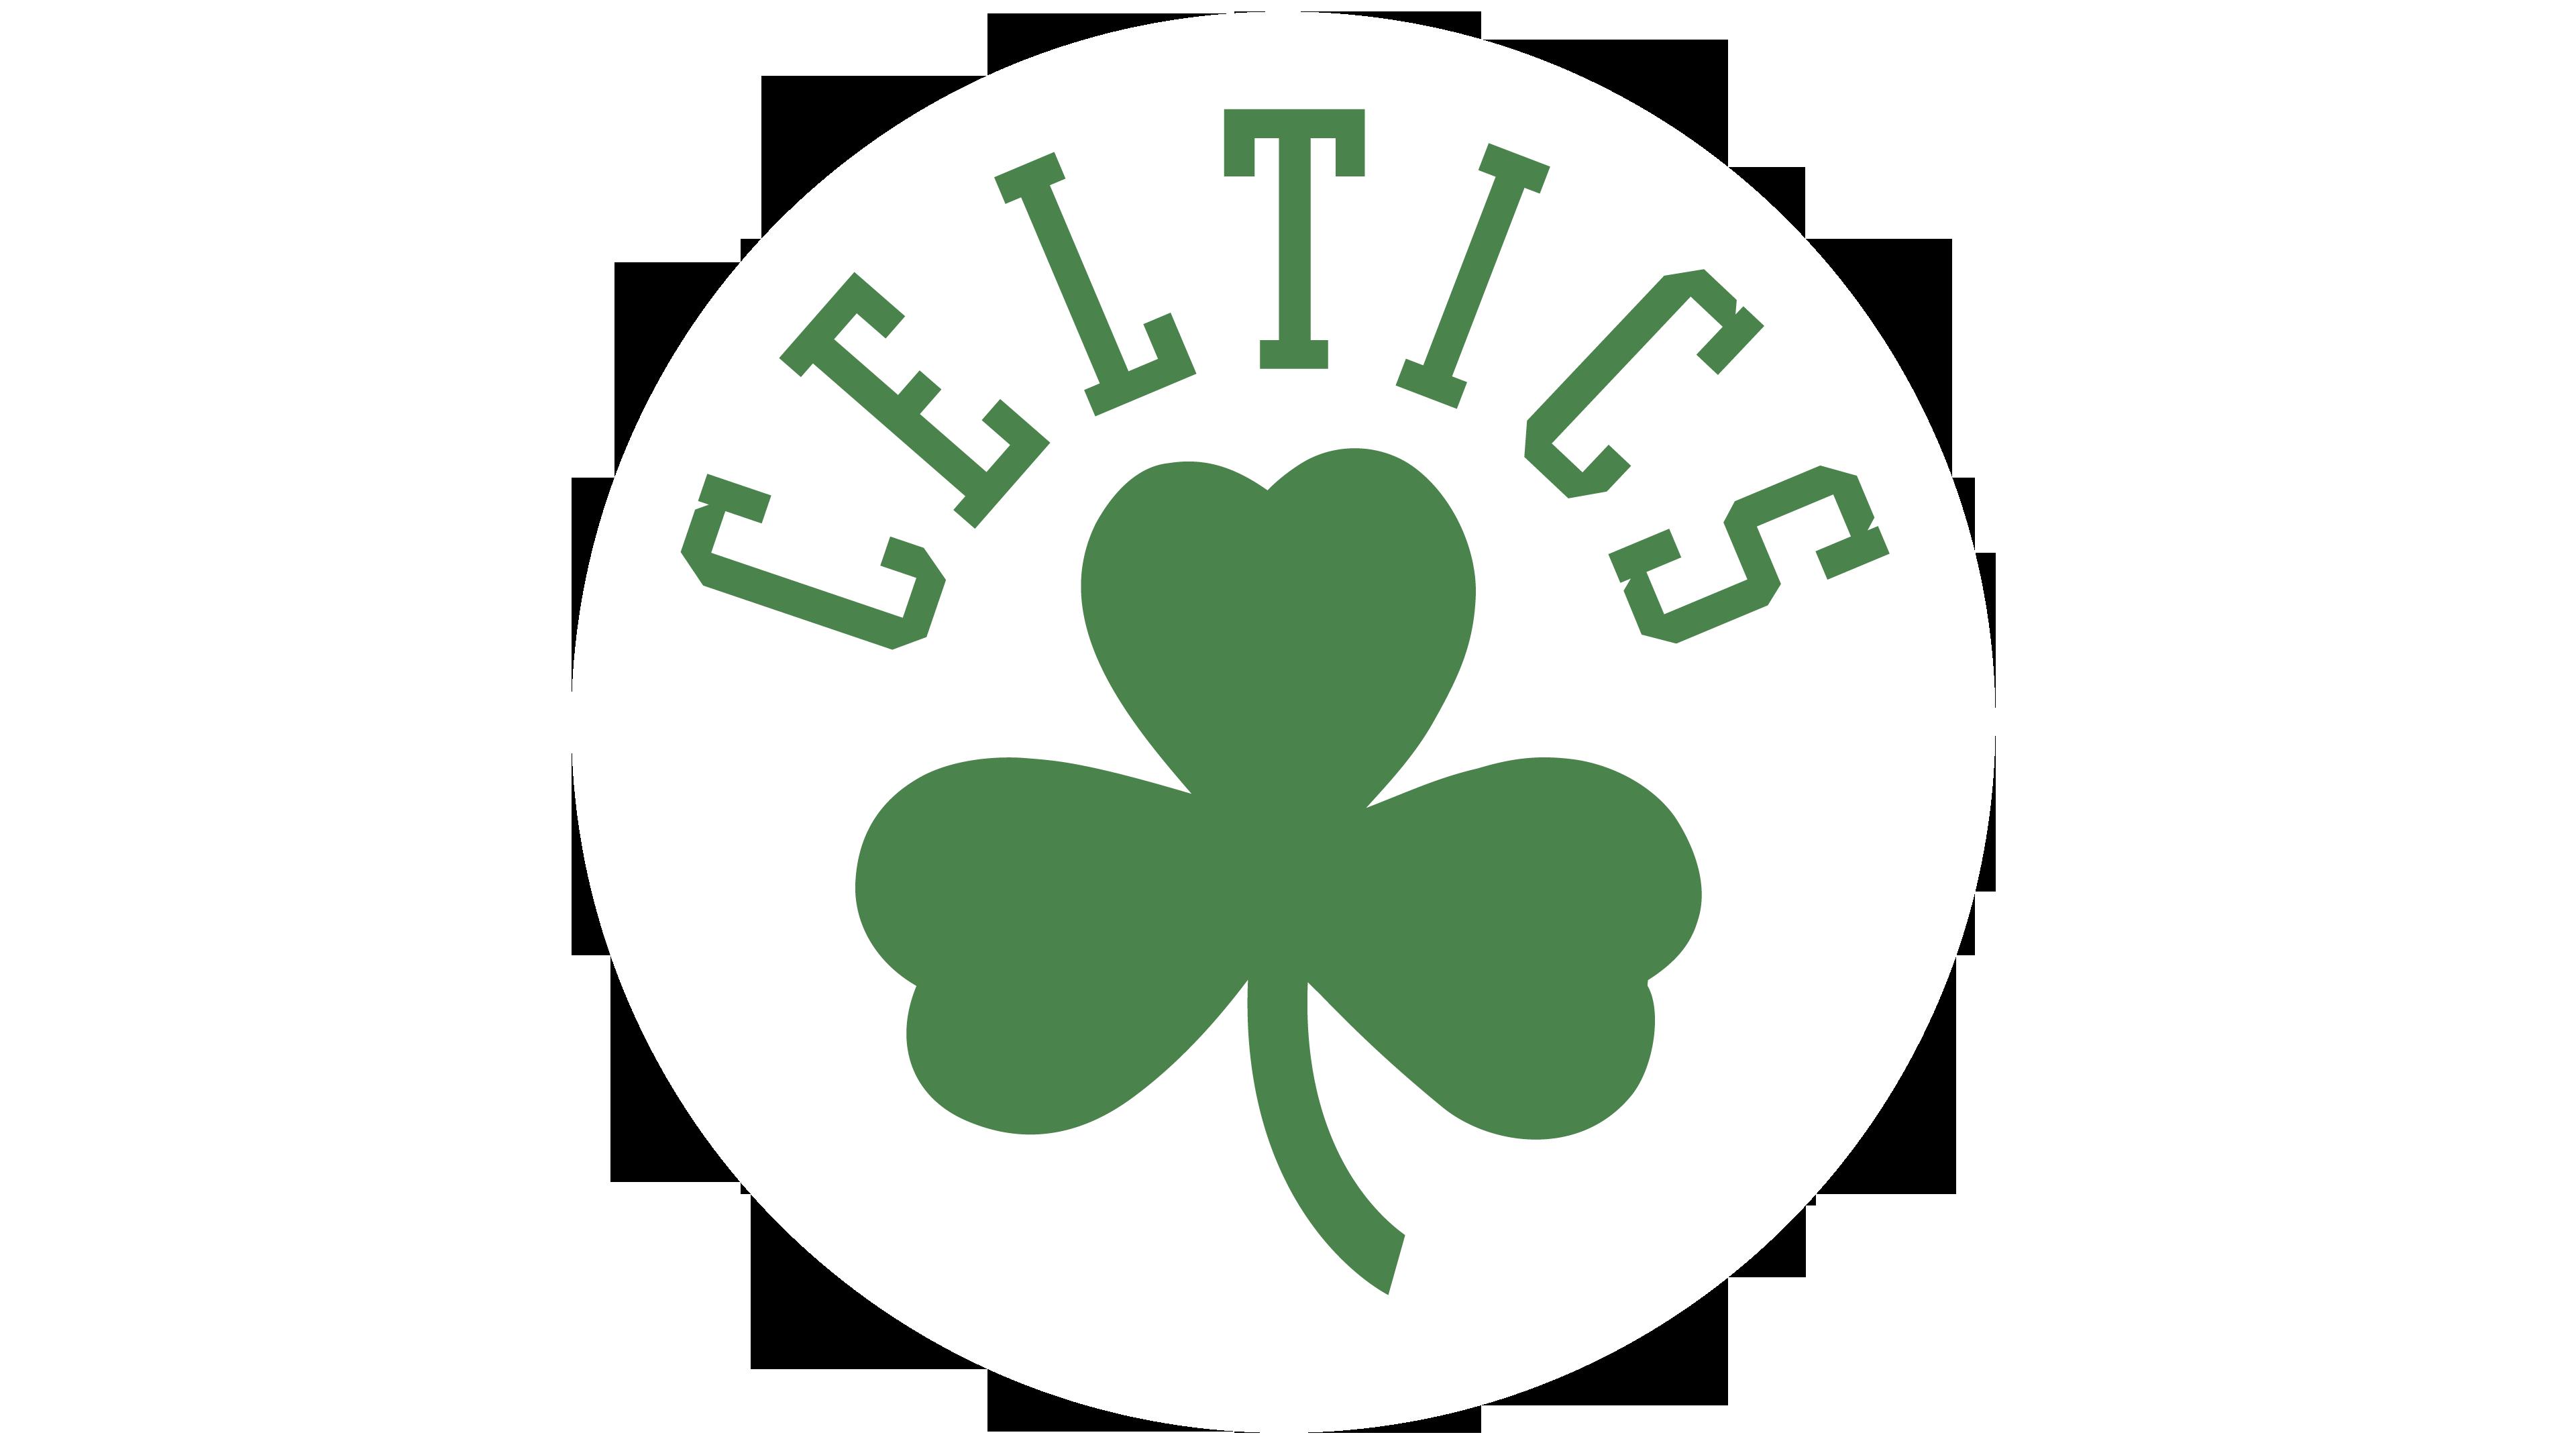 Boston celtics basketball clipart free Boston Celtics Logo - Interesting History of the Team Name and emblem free